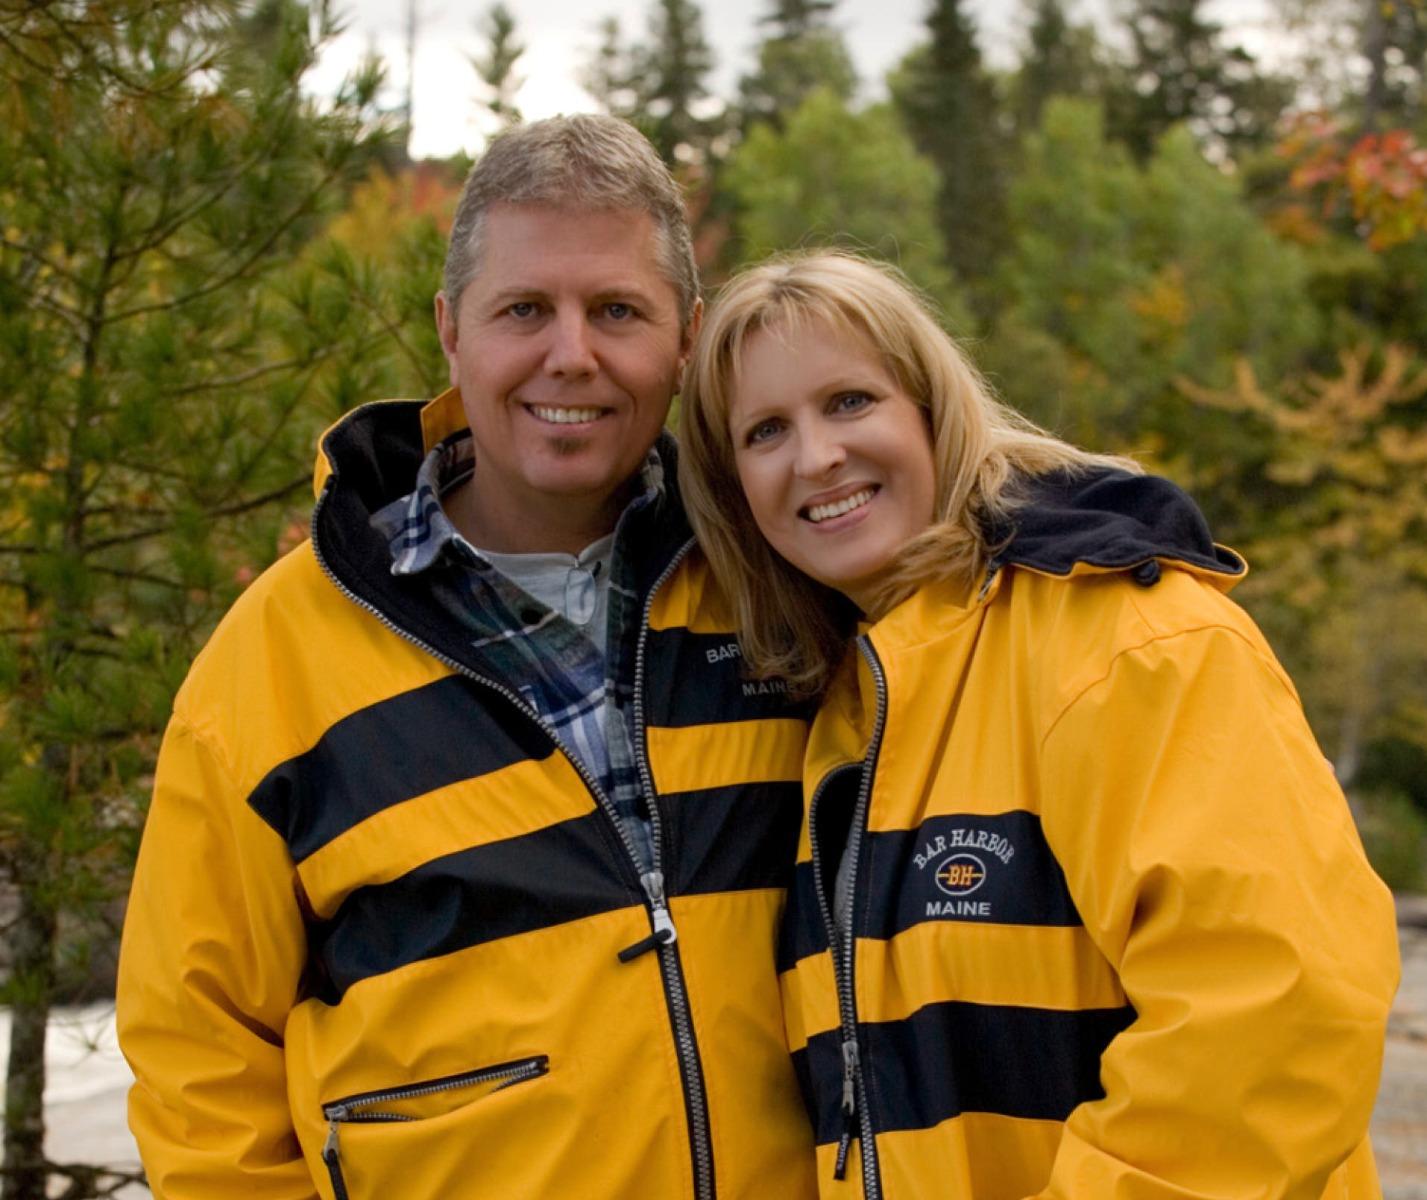 Mike & Kate Battistelli